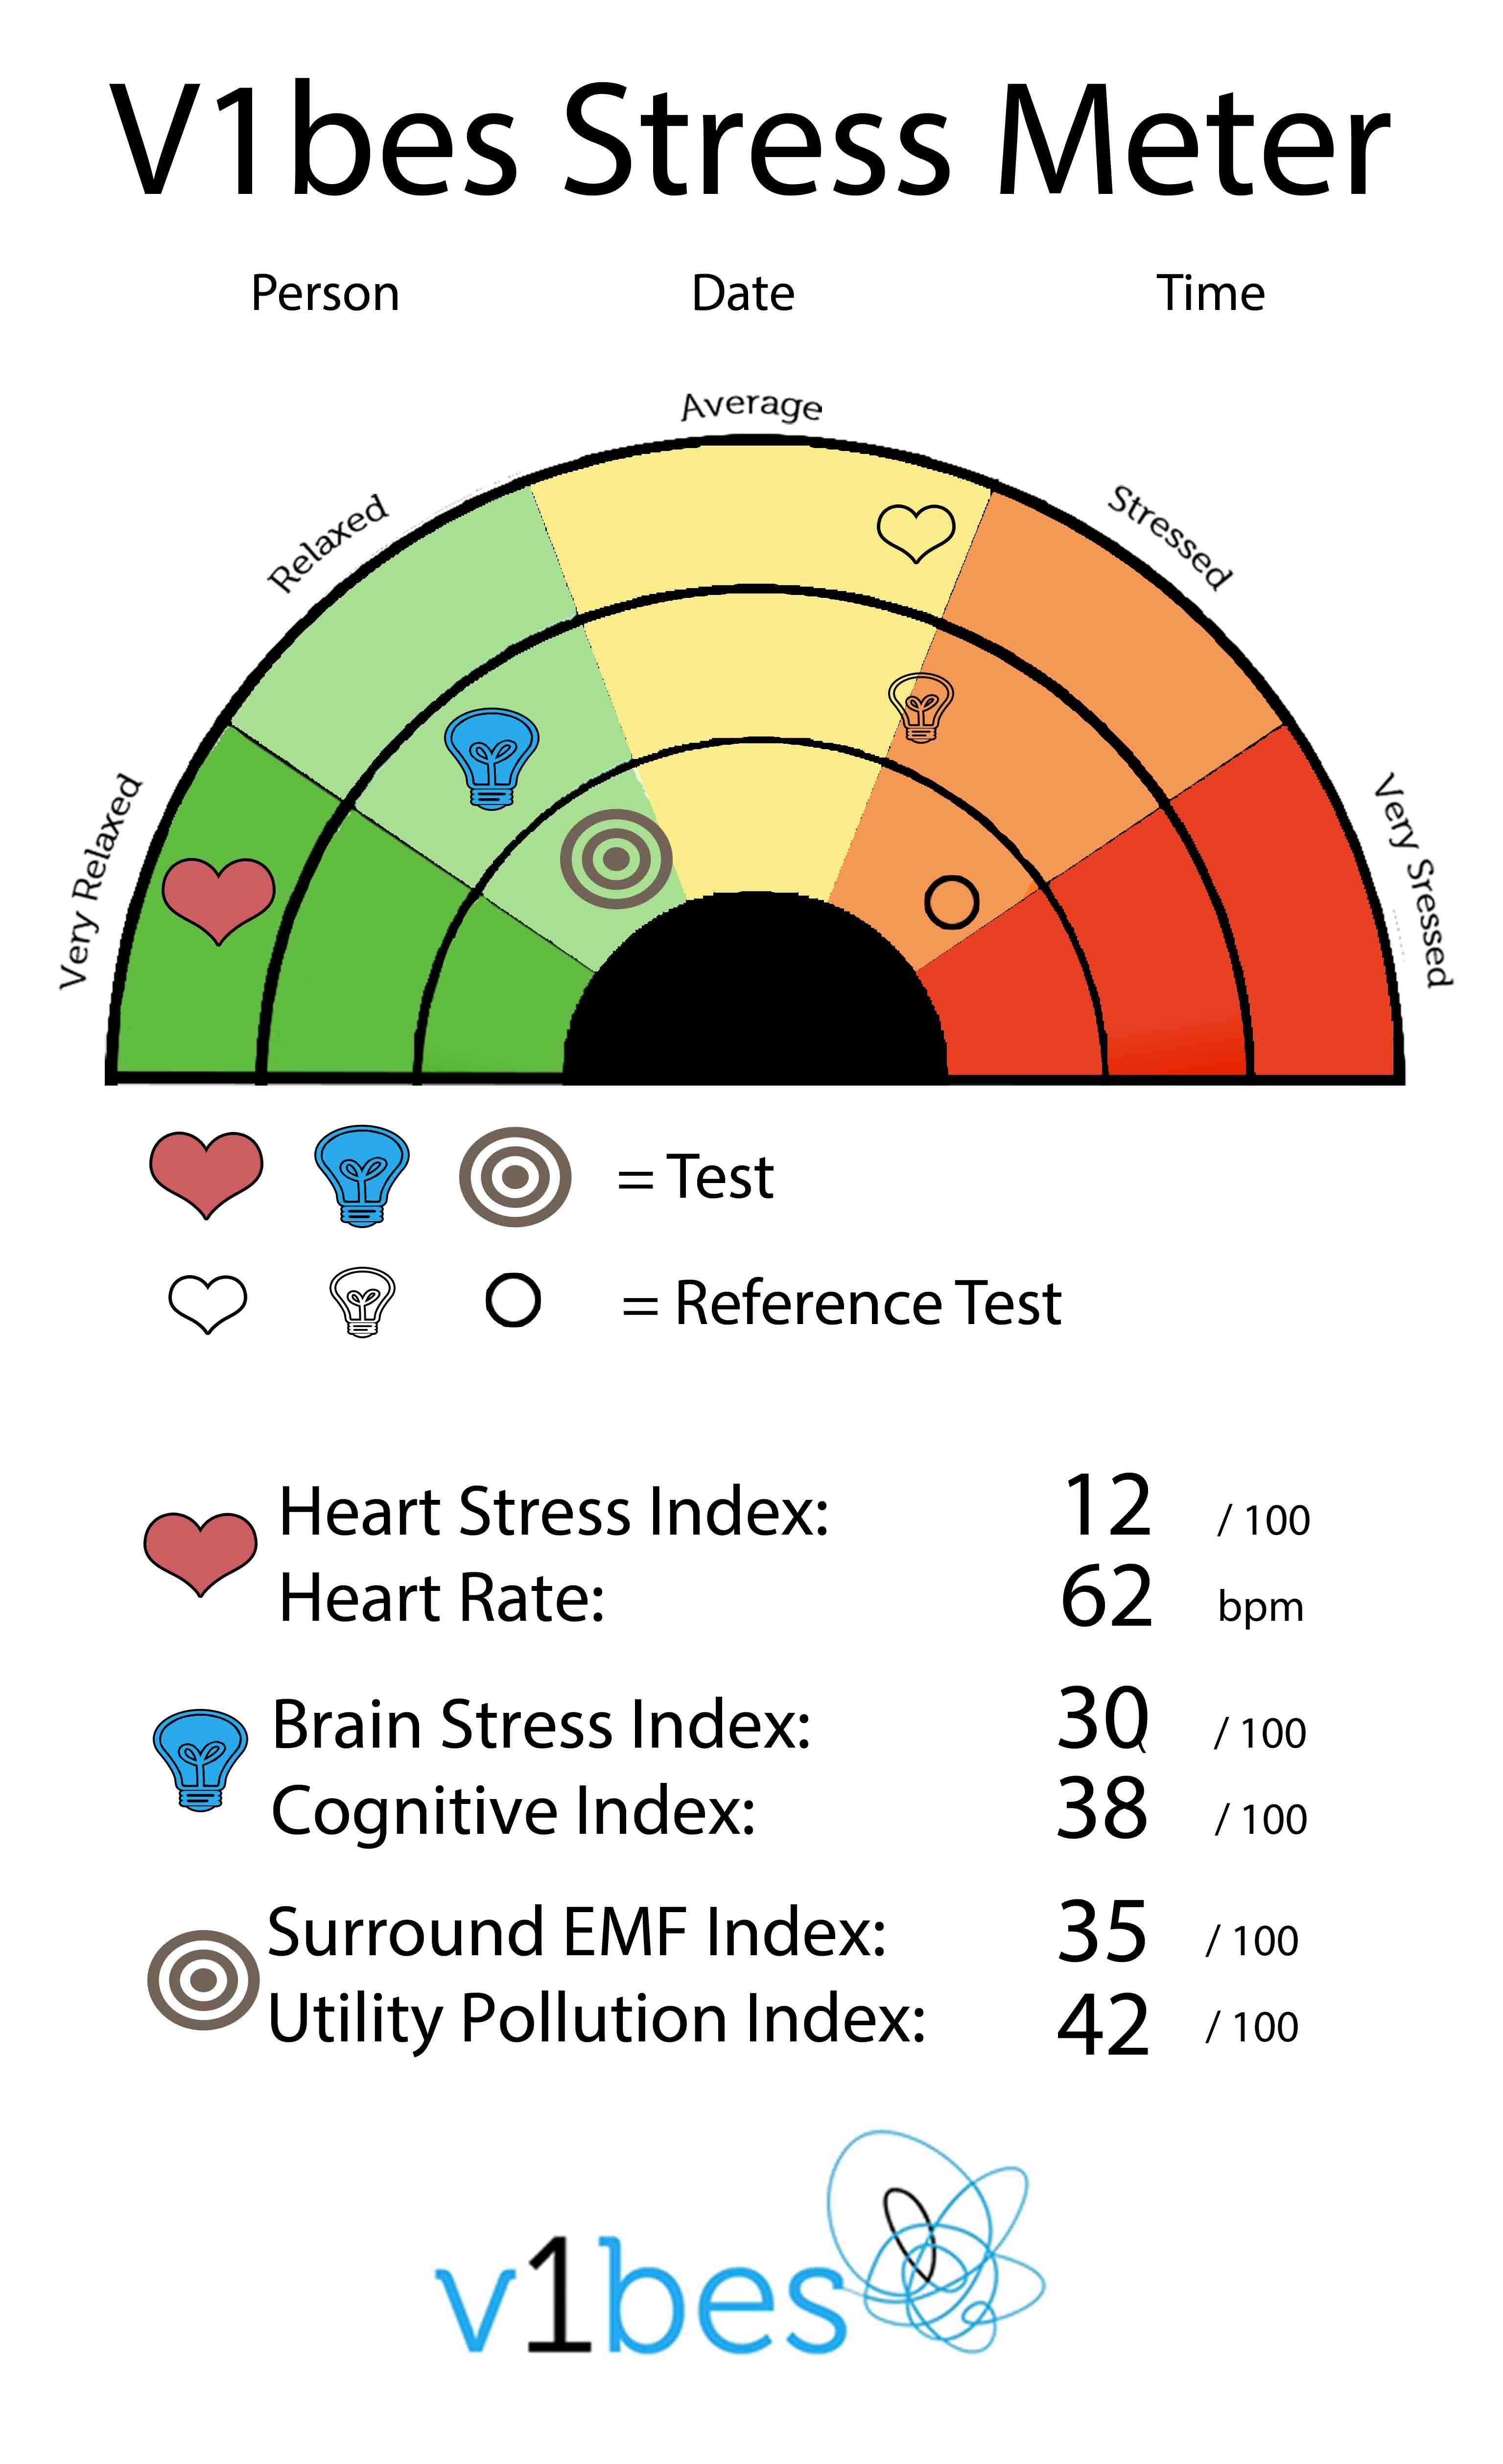 The V1bes Stress Meter